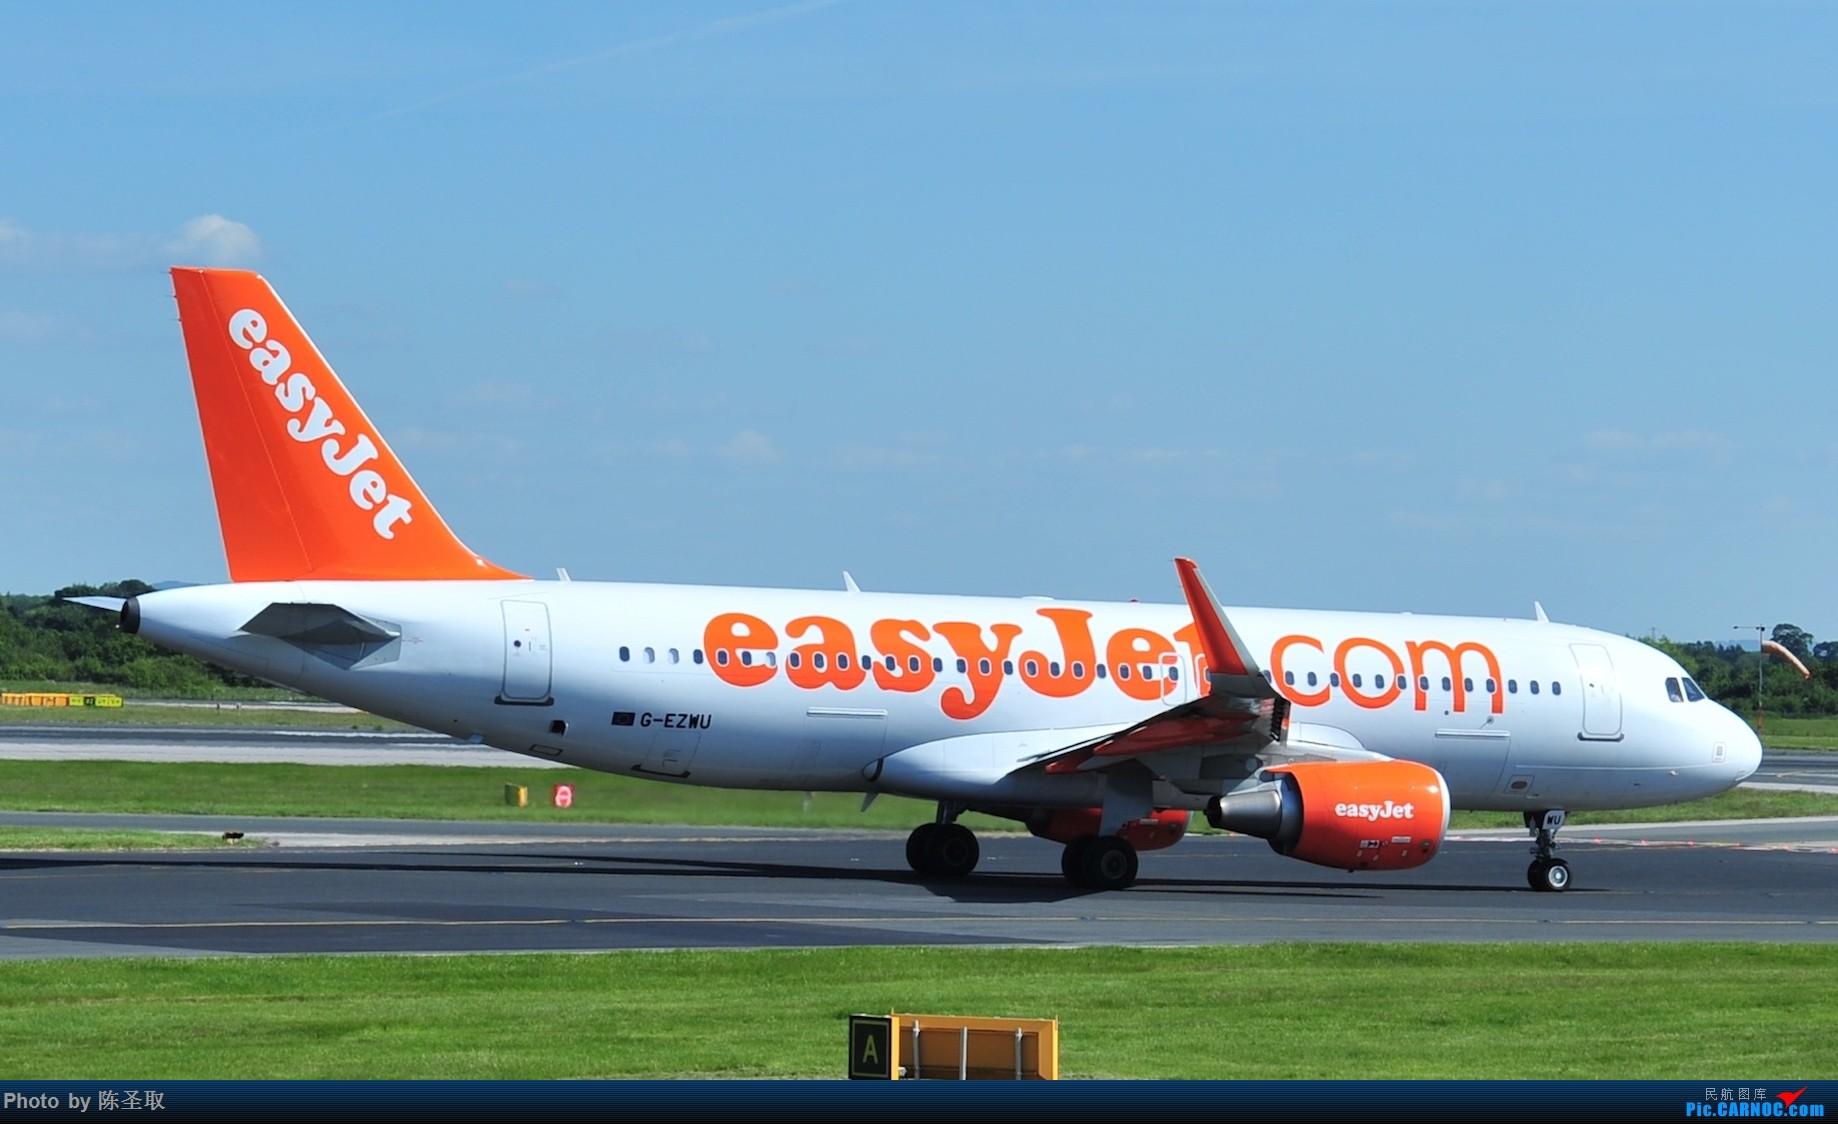 Re:[原创]迟来的6月曼城拍机图。廉价航空的天堂,曼彻斯特机场~ AIRBUS A320-214(W) G-EZWU 英国曼彻斯特机场